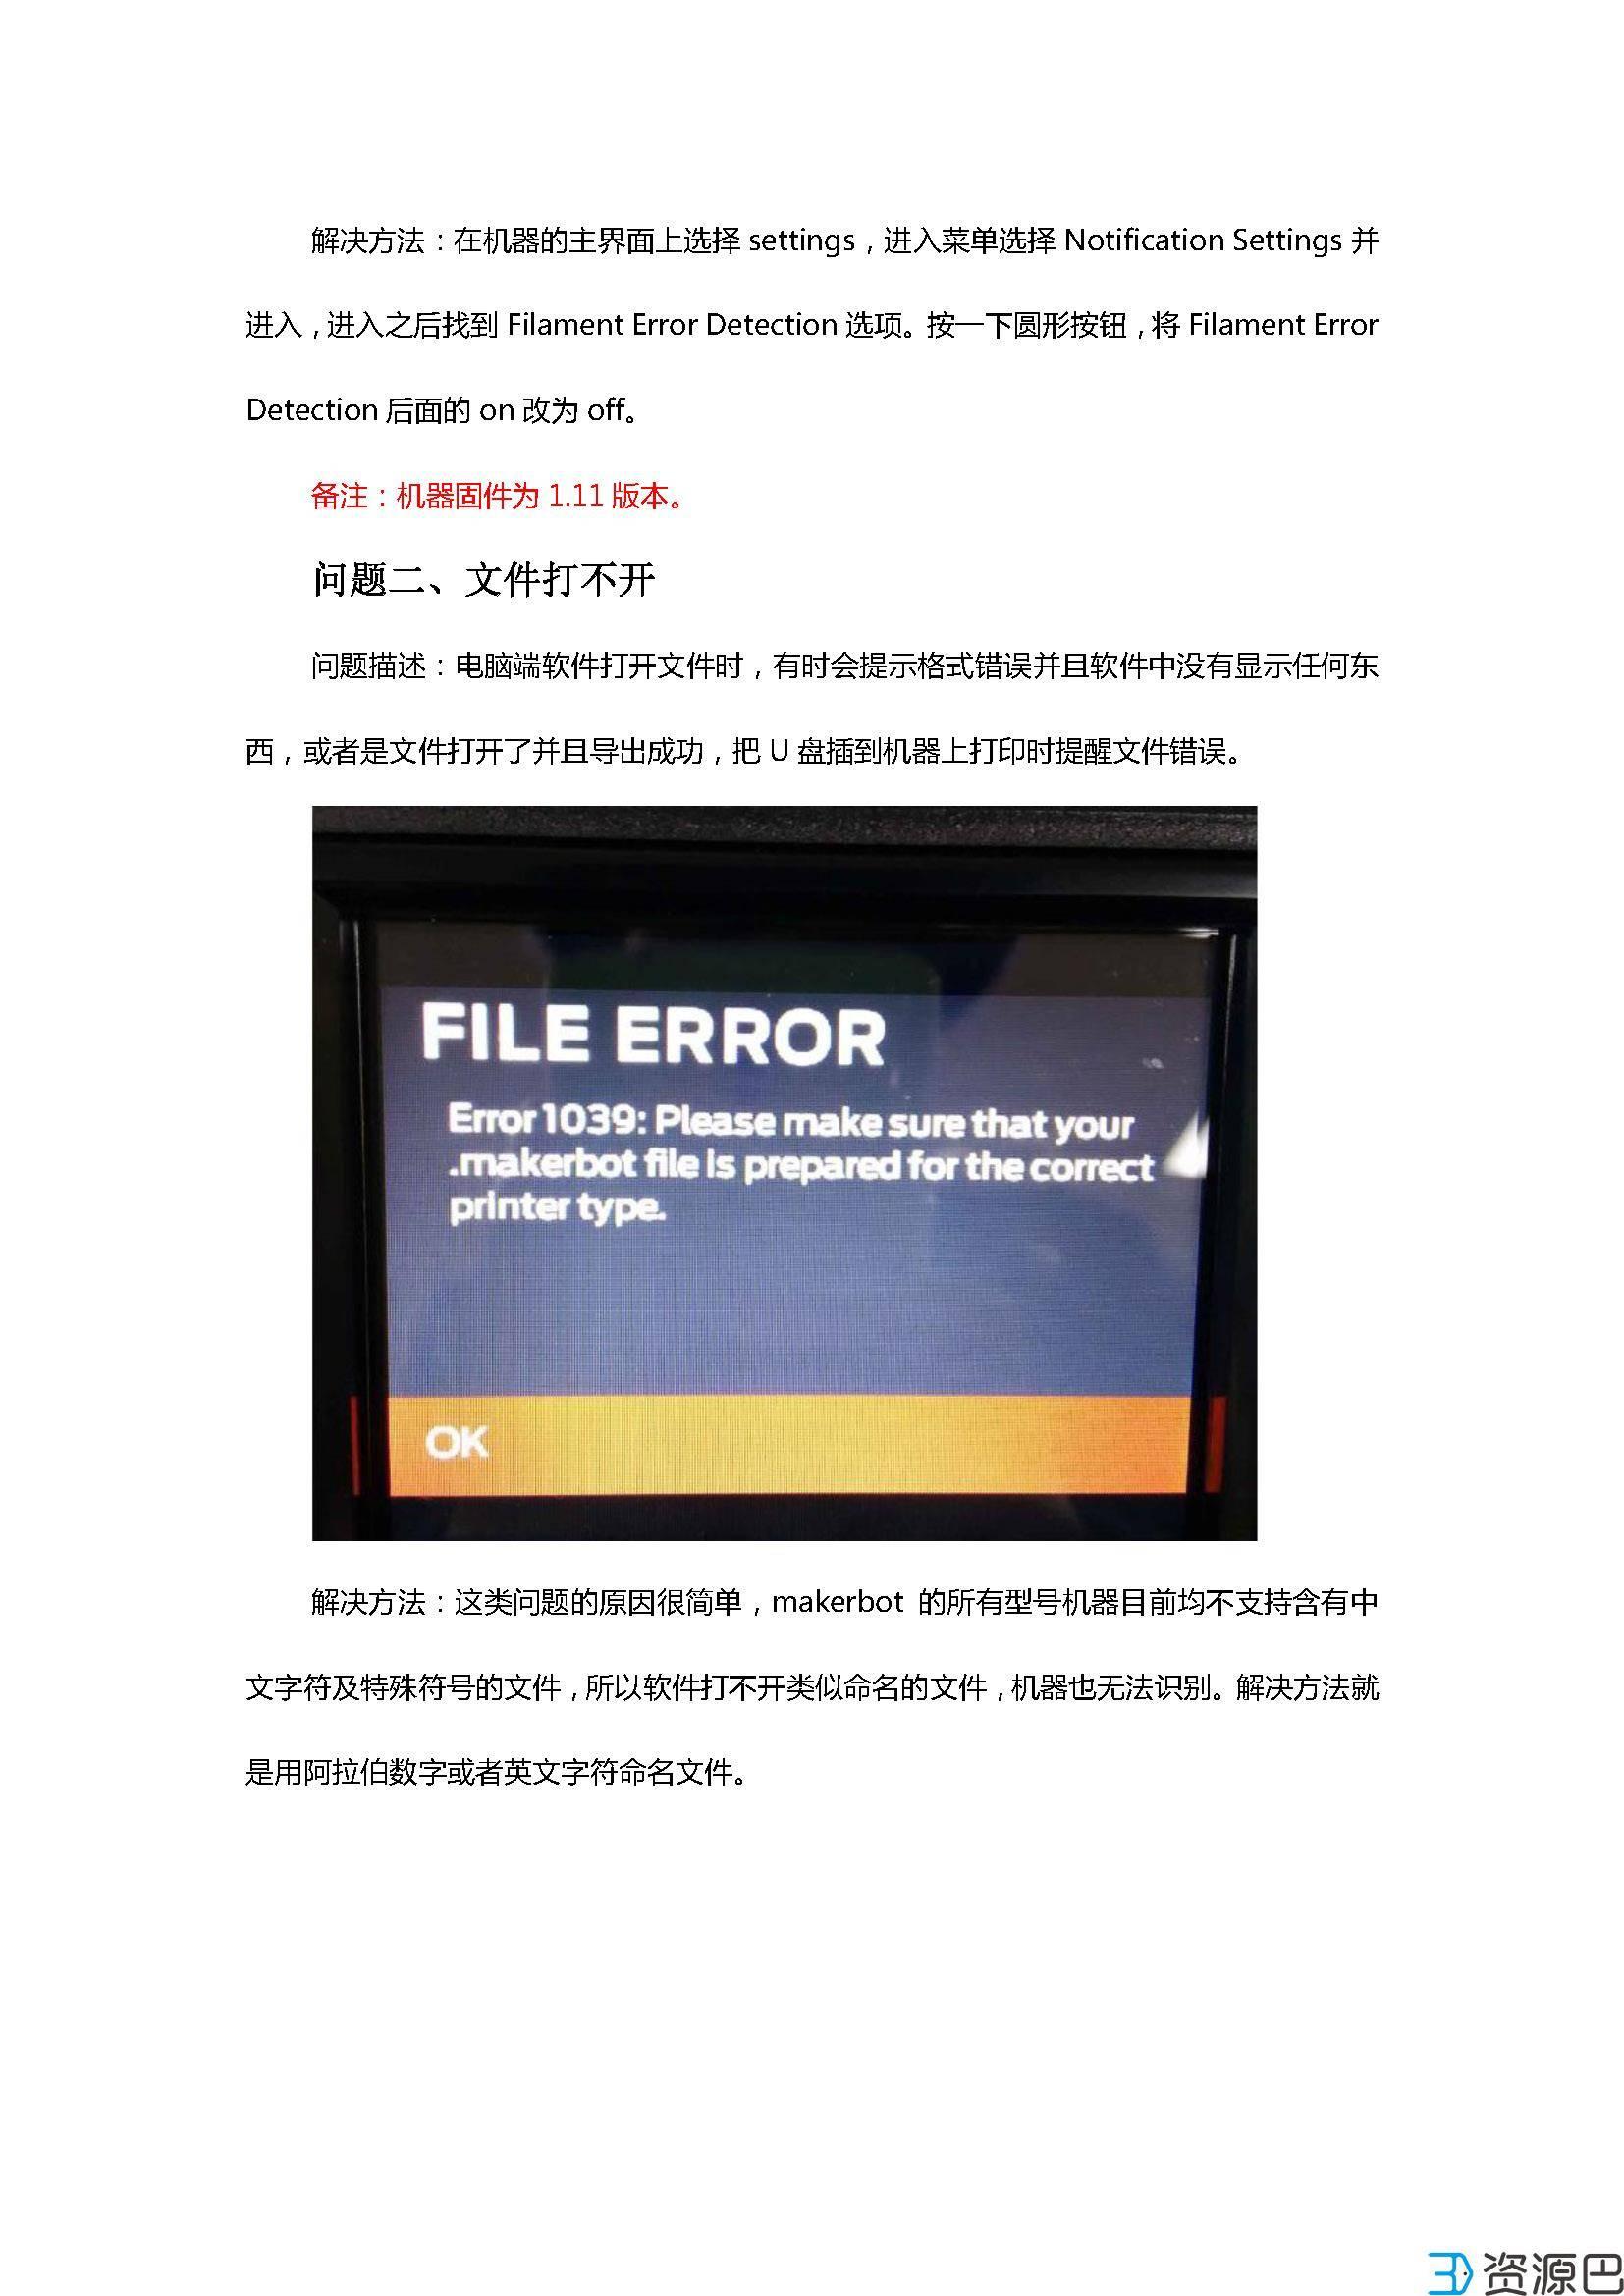 MakerBot Replicator 3d打印机 技术文档插图3